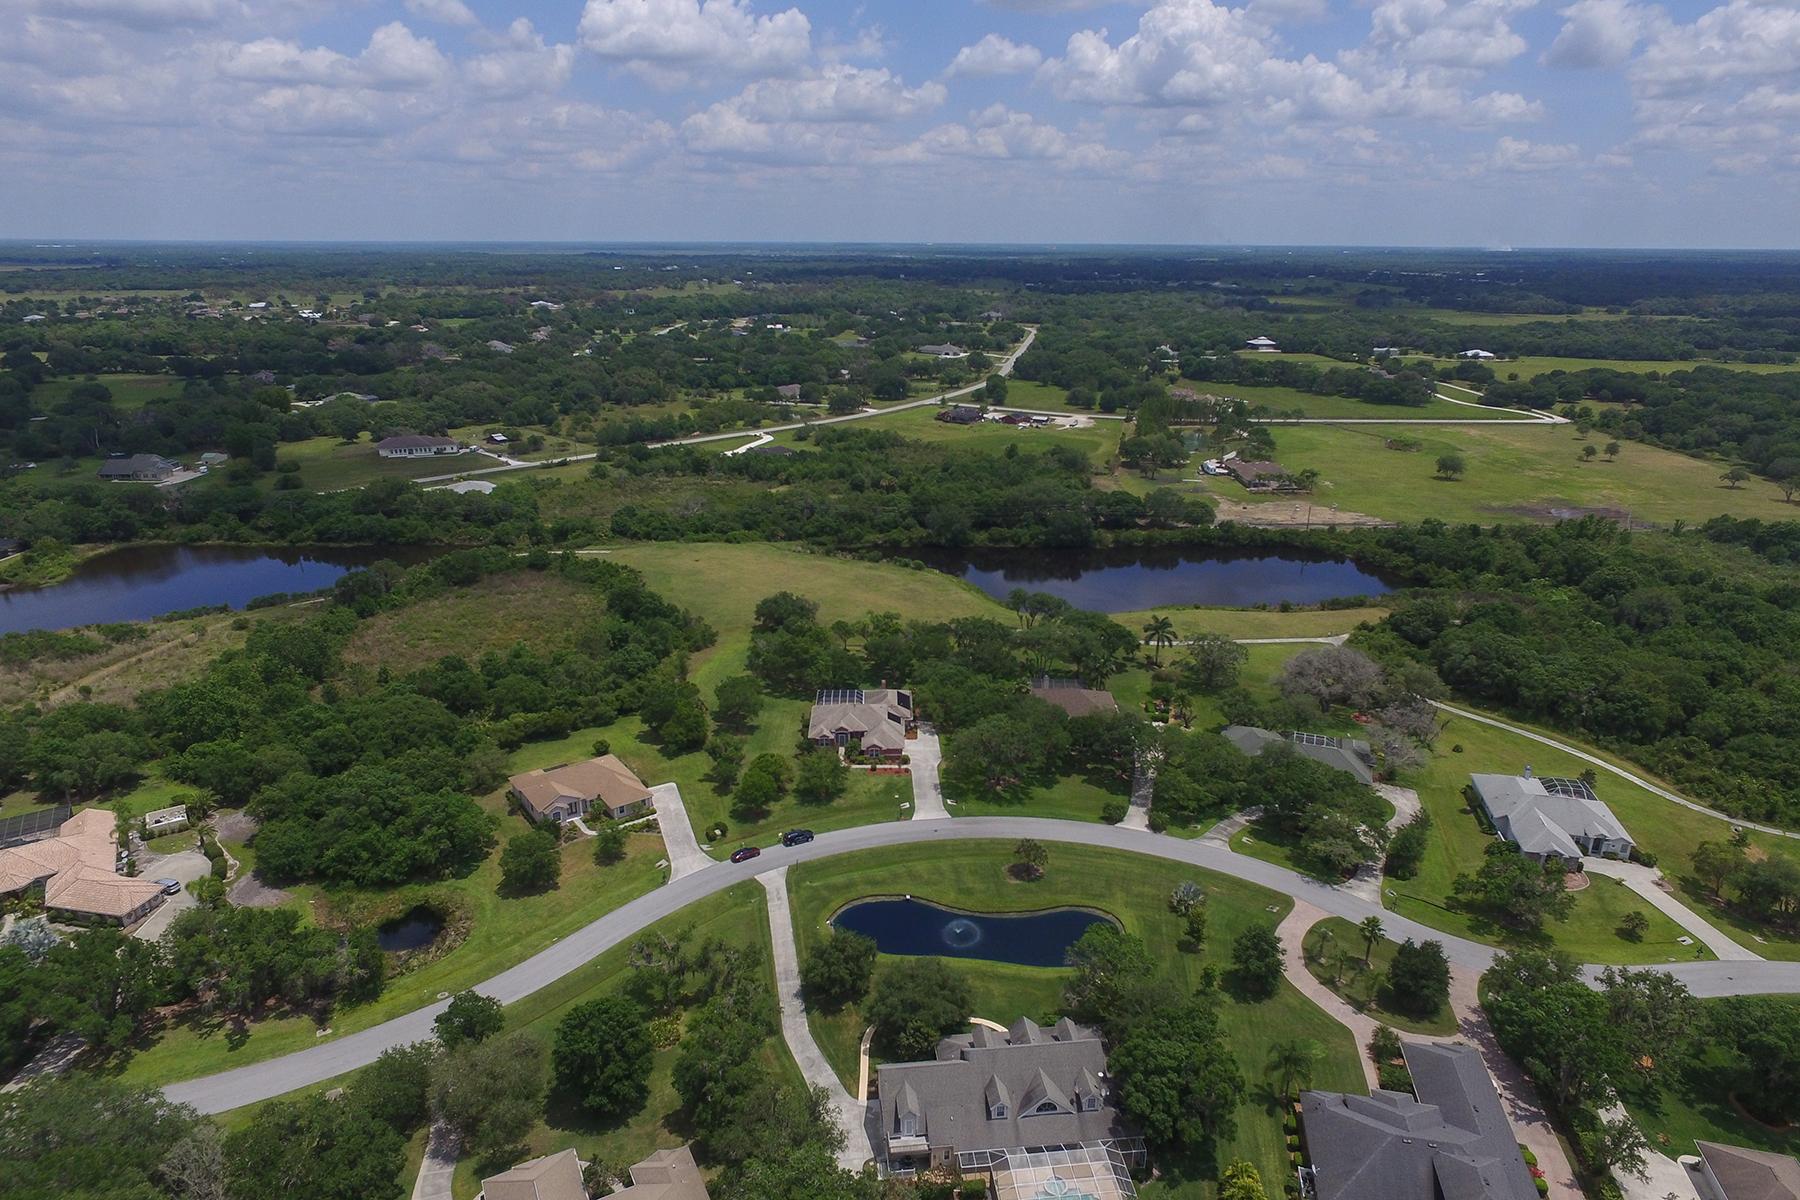 Single Family Home for Sale at OAK FORDE GOLF CLUB 1575 Kingsdown Dr Sarasota, Florida, 34240 United States